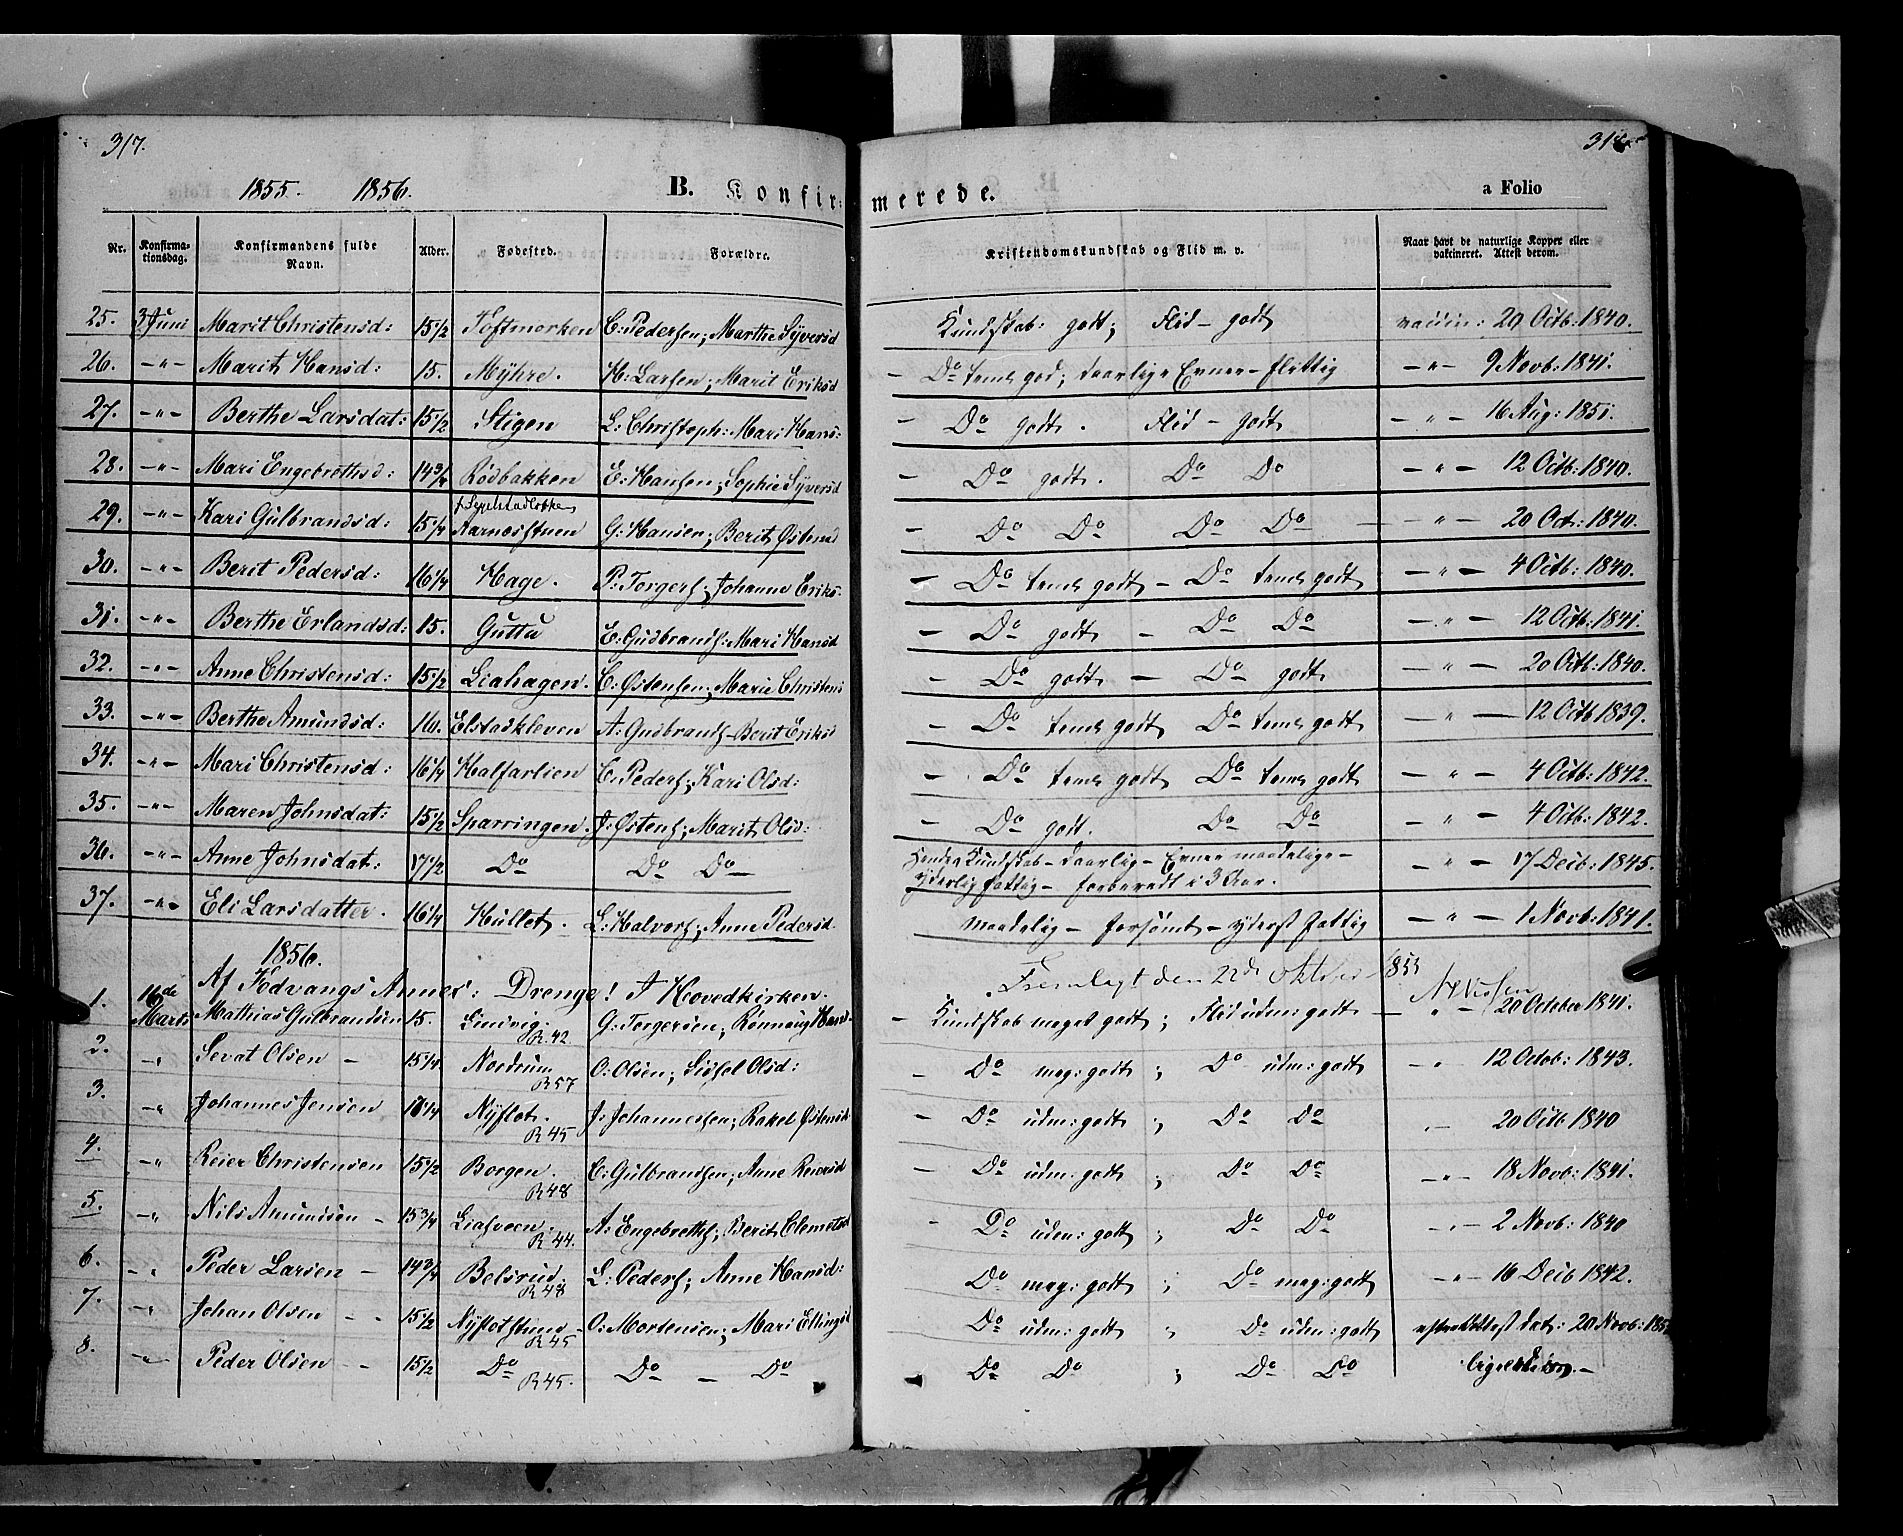 SAH, Ringebu prestekontor, Ministerialbok nr. 6, 1848-1859, s. 317-318